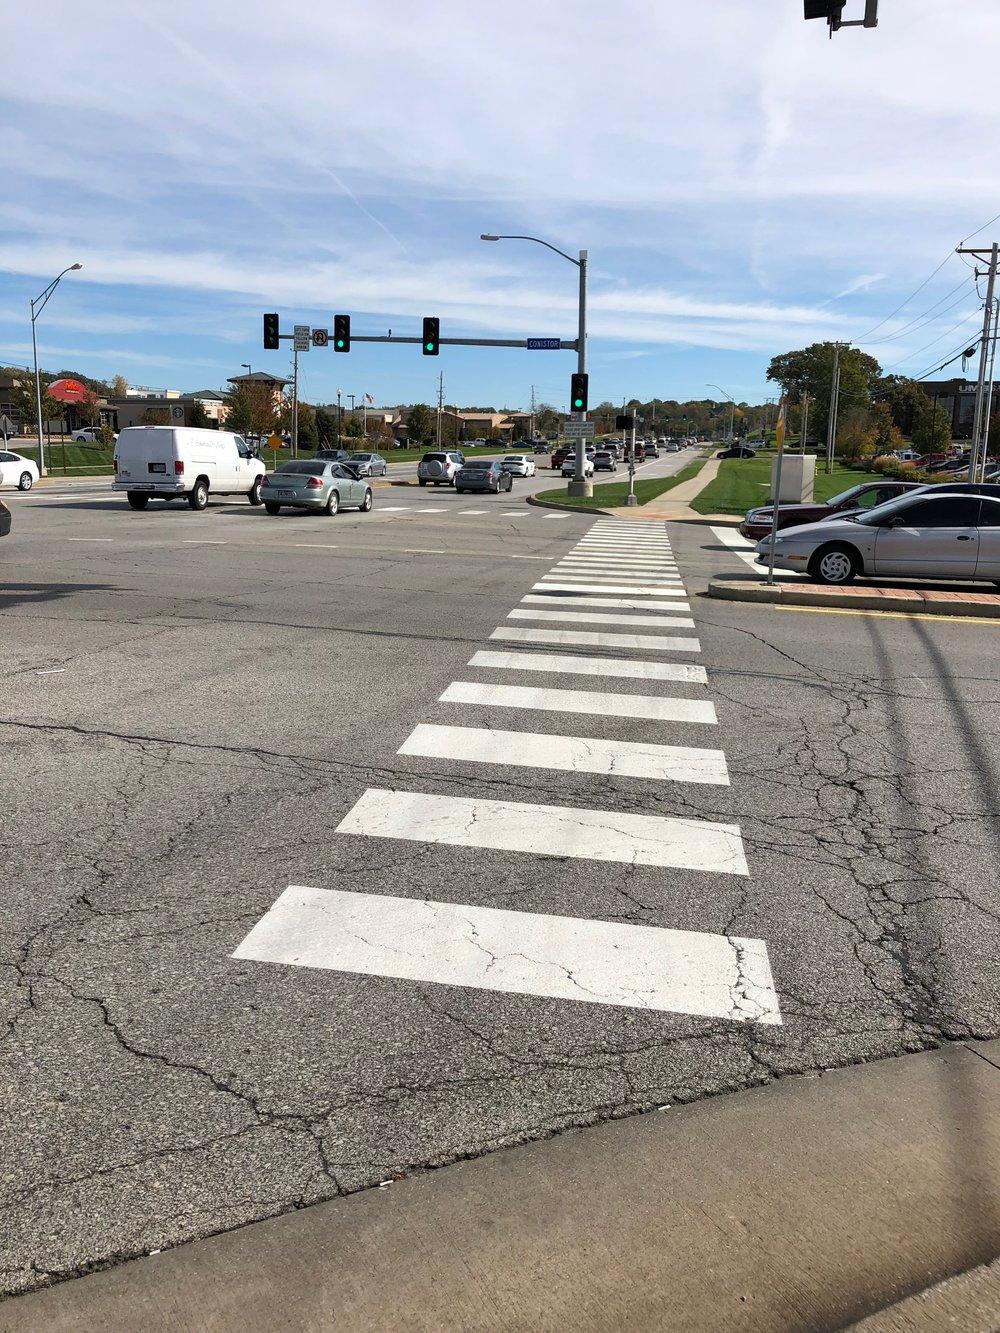 Road-markings-Liberty-Missouri.jpg